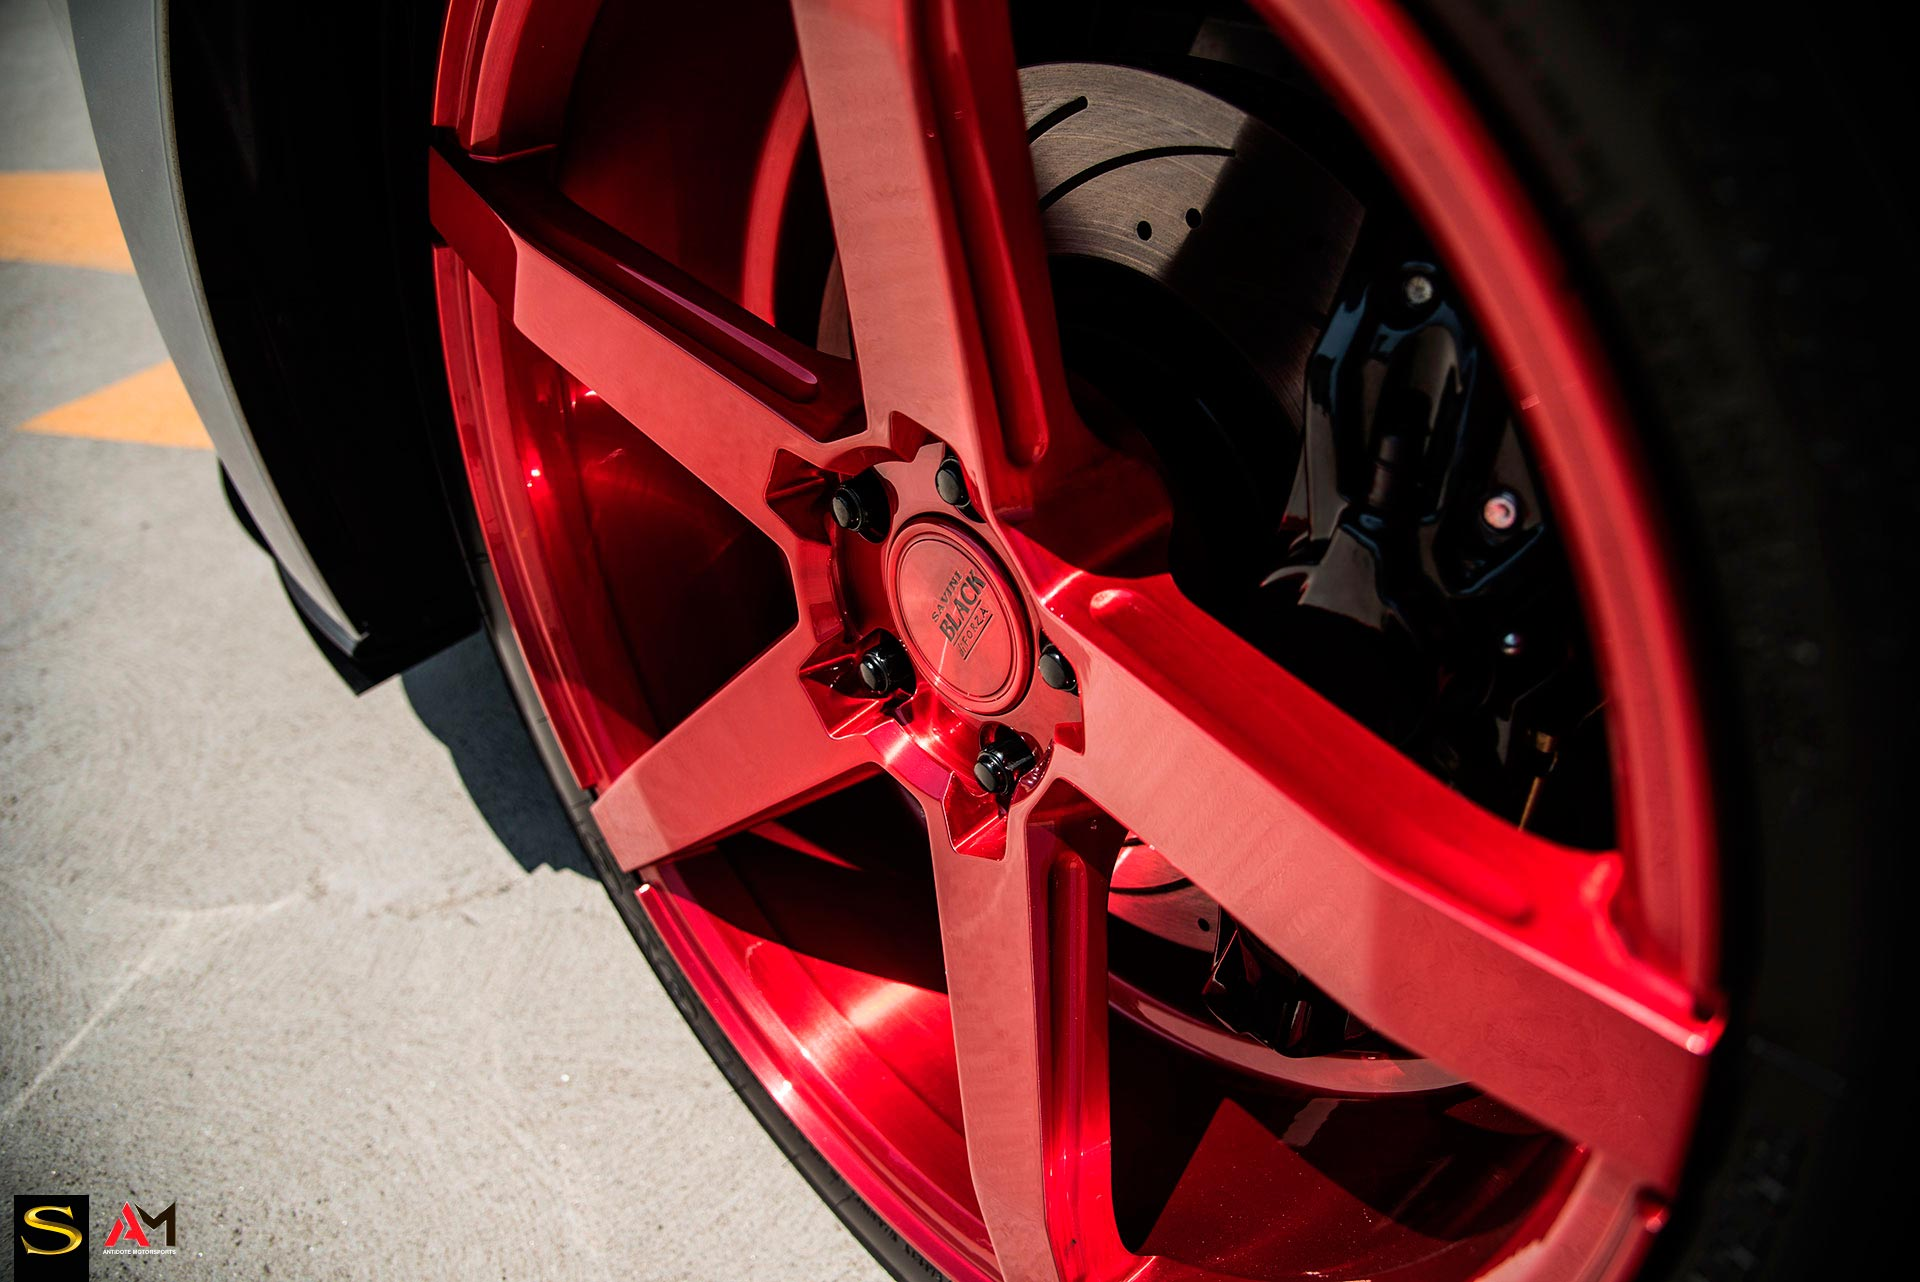 savini-wheels-black-di-forza-bm11-brushed-red-ford-mustang-gt-antidote4